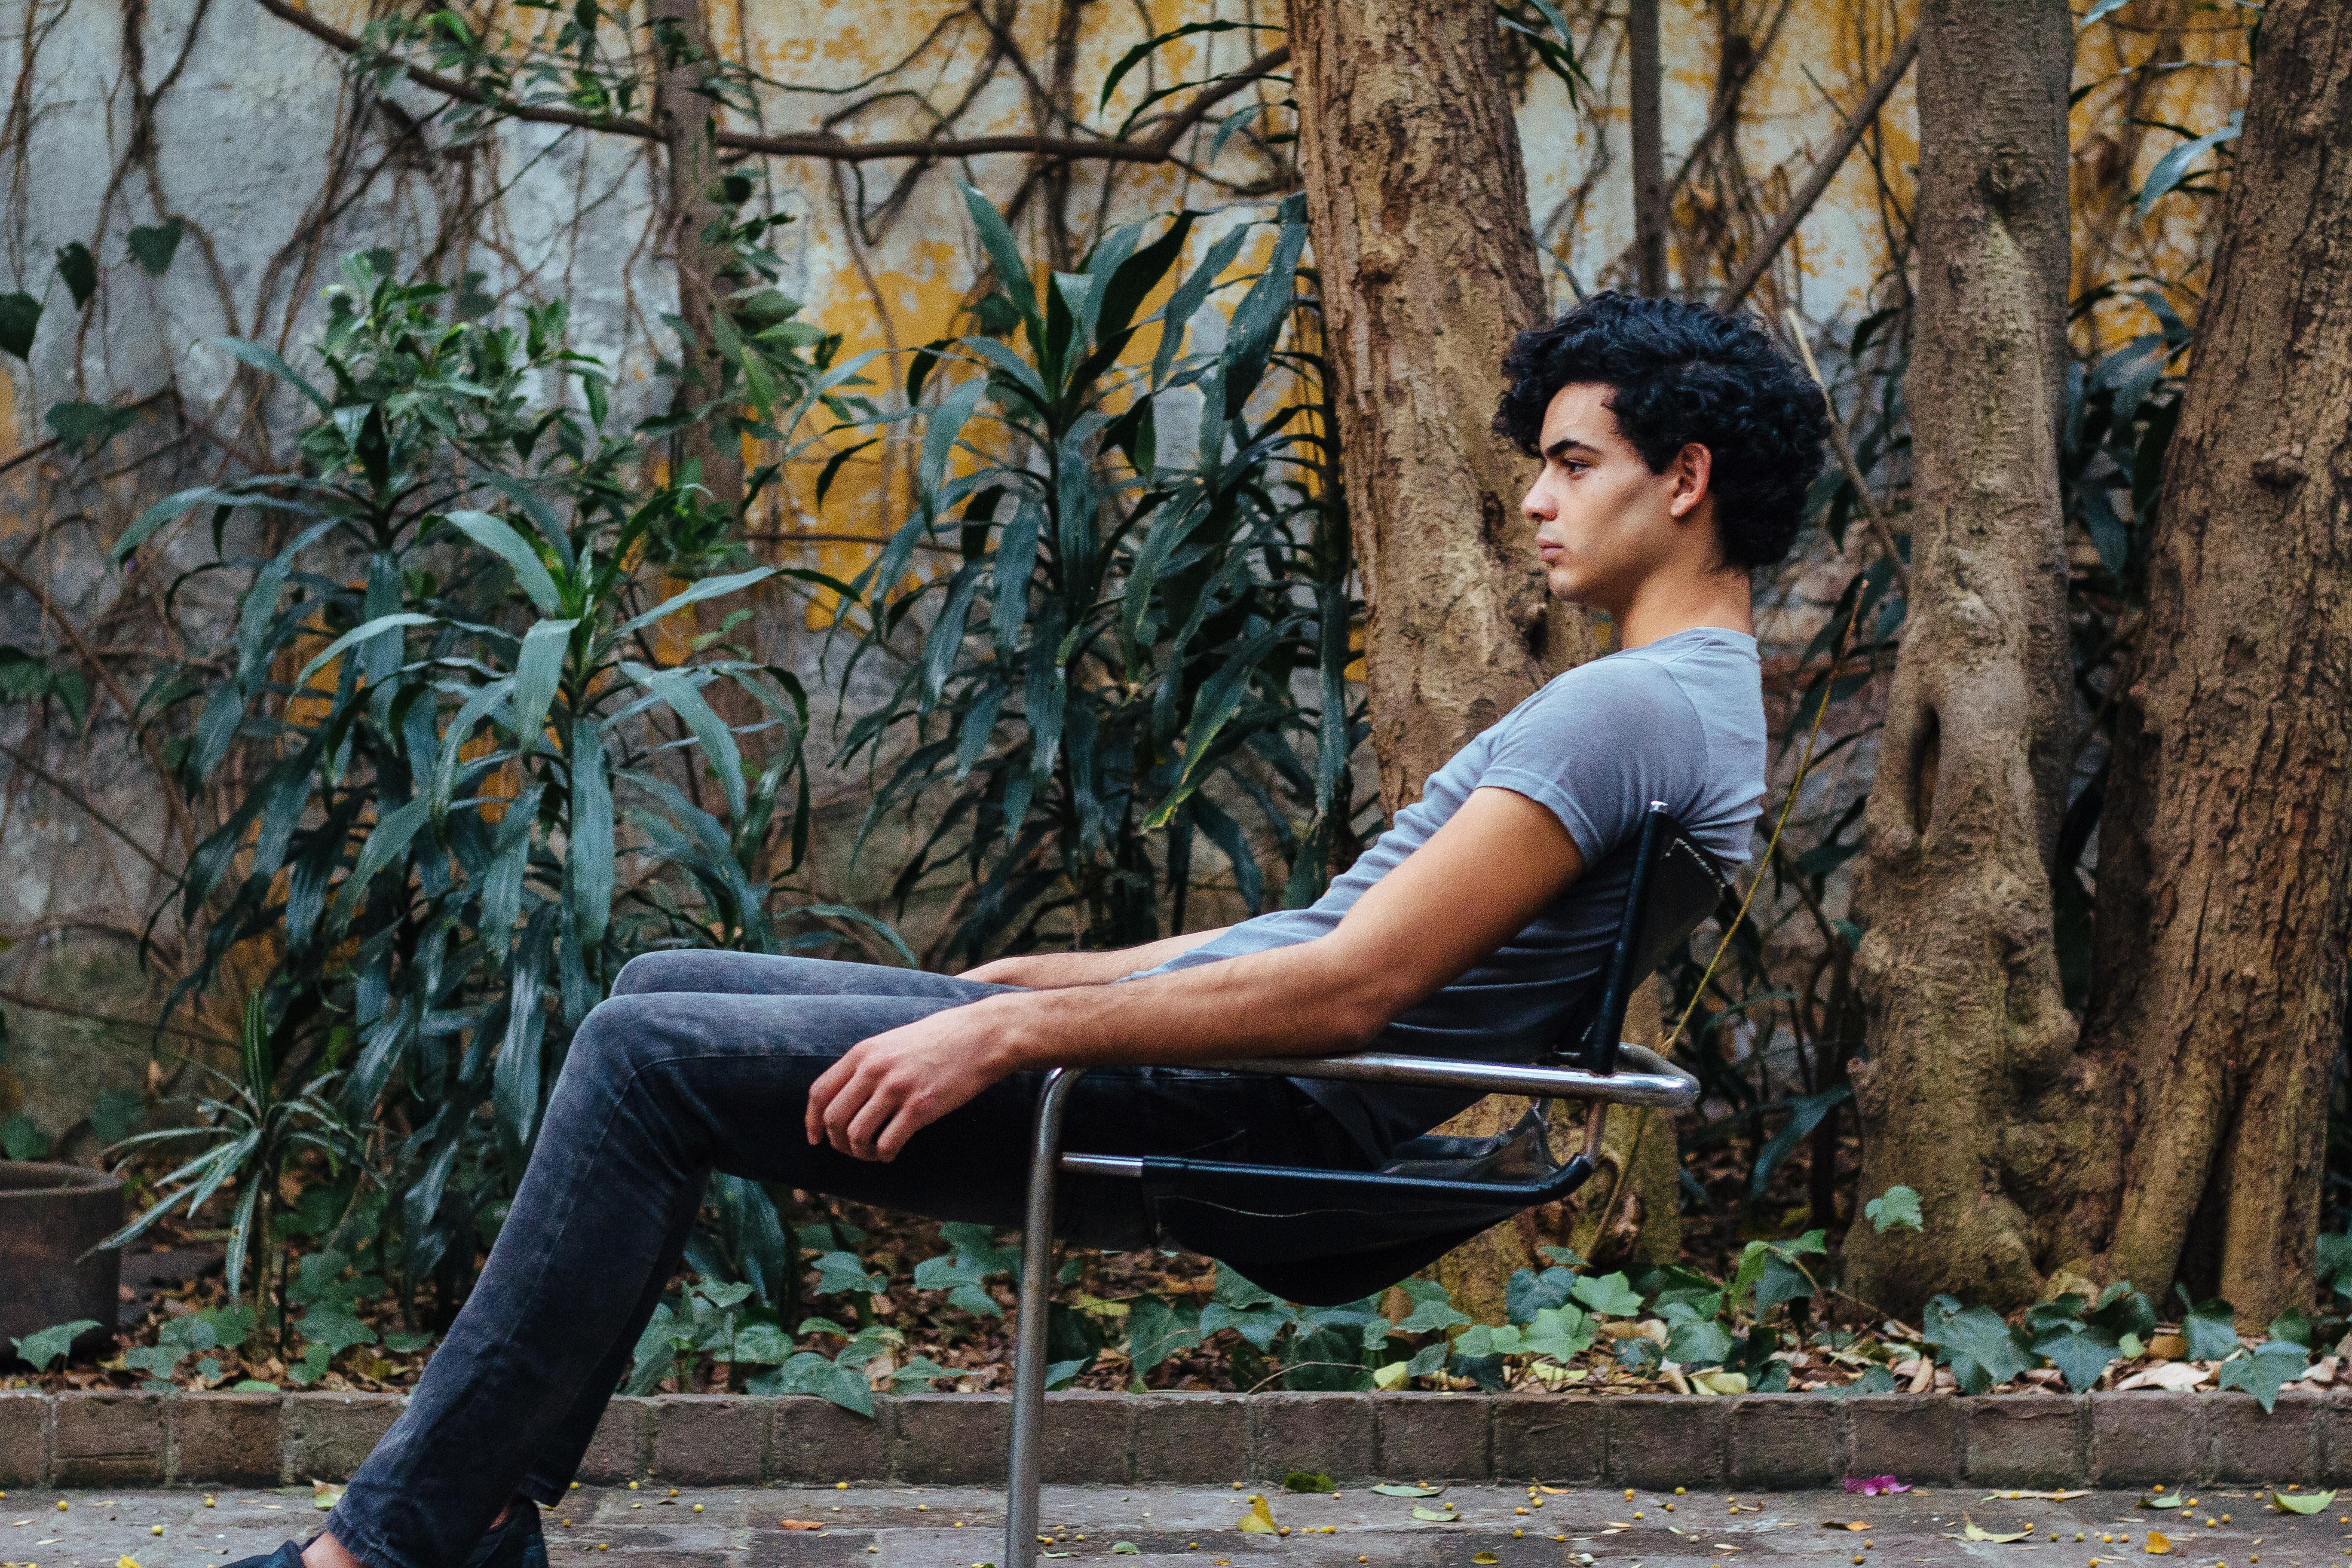 man sitting on gray steel chair